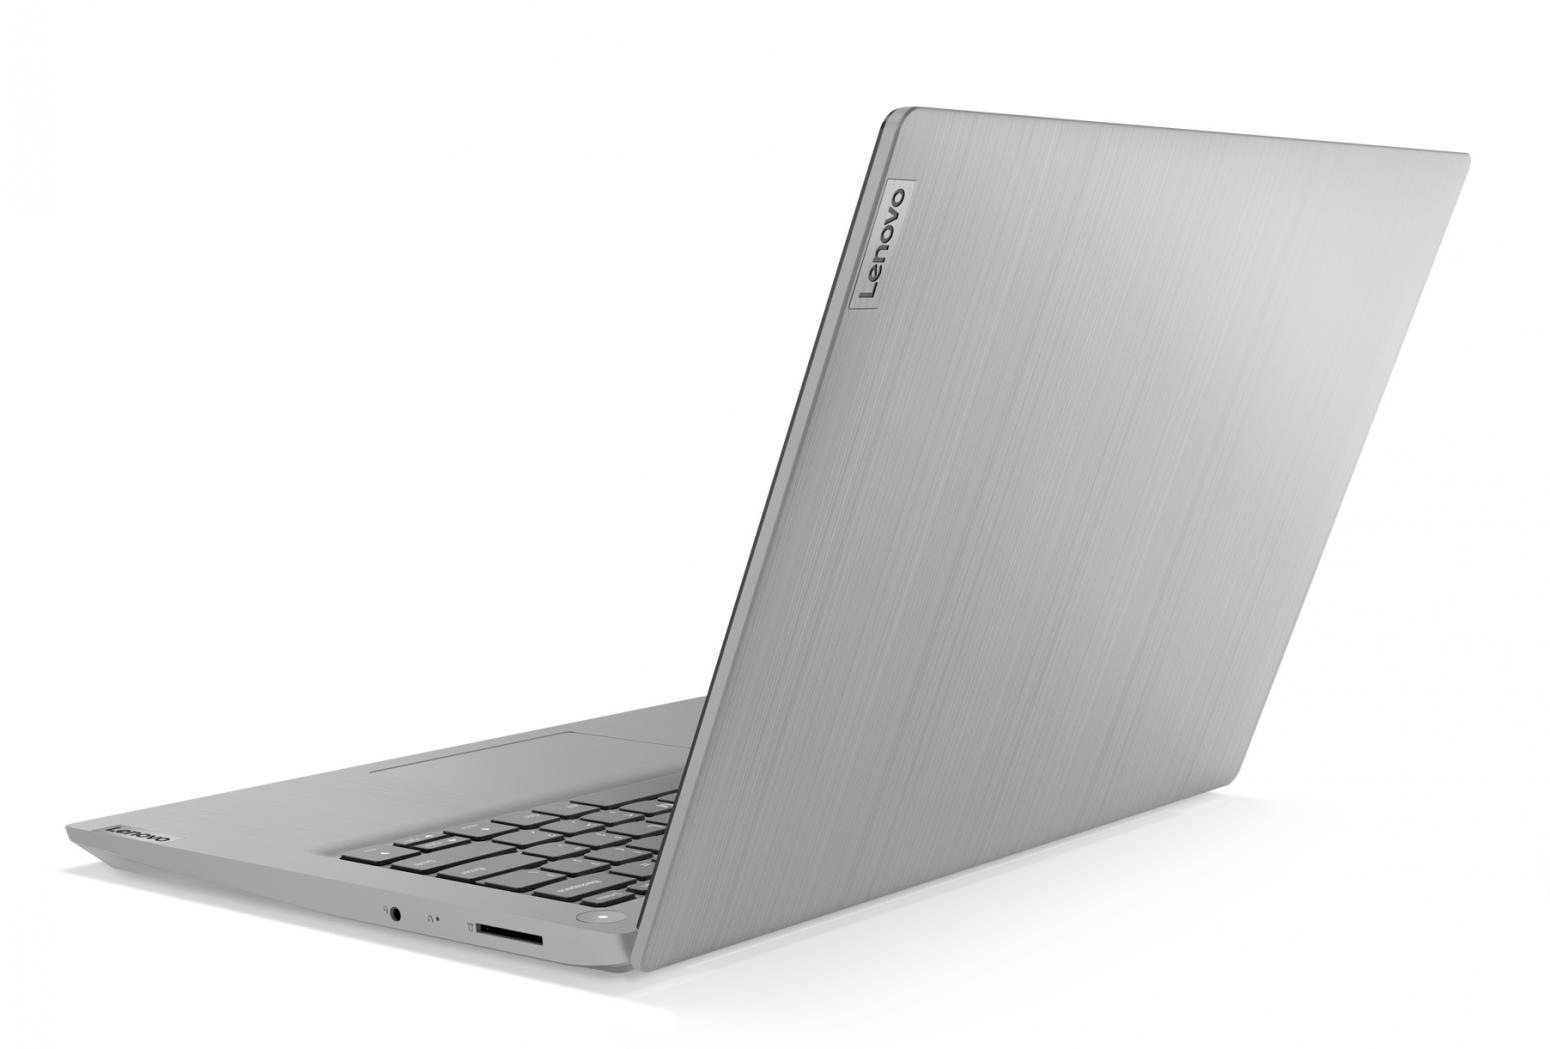 Ordinateur portable Lenovo IdeaPad 3 14IIL05 (81WD00EYFR) Argent - photo 5